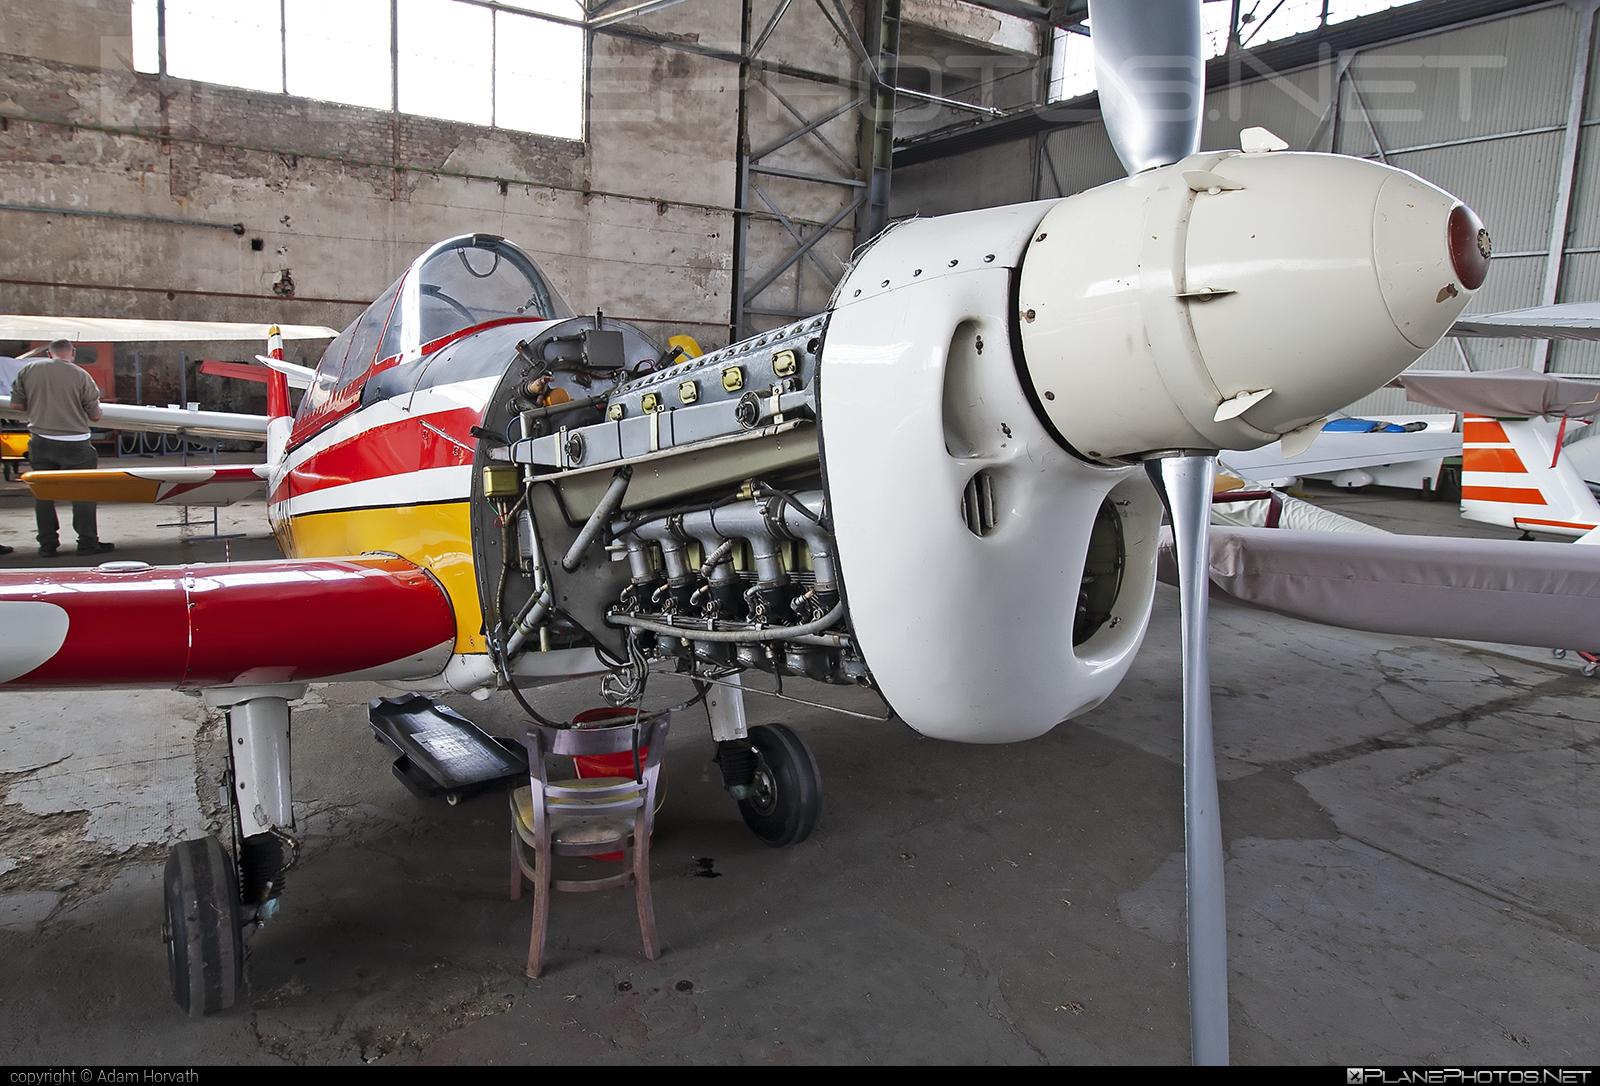 Zlin Z-526F Trenér Master - HA-SAM operated by Magyar Repülő Szövetség (Hungarian Aeronautical Association) #magyarrepuloszovetseg #trenermaster #z526 #z526trenermaster #zlin #zlin526